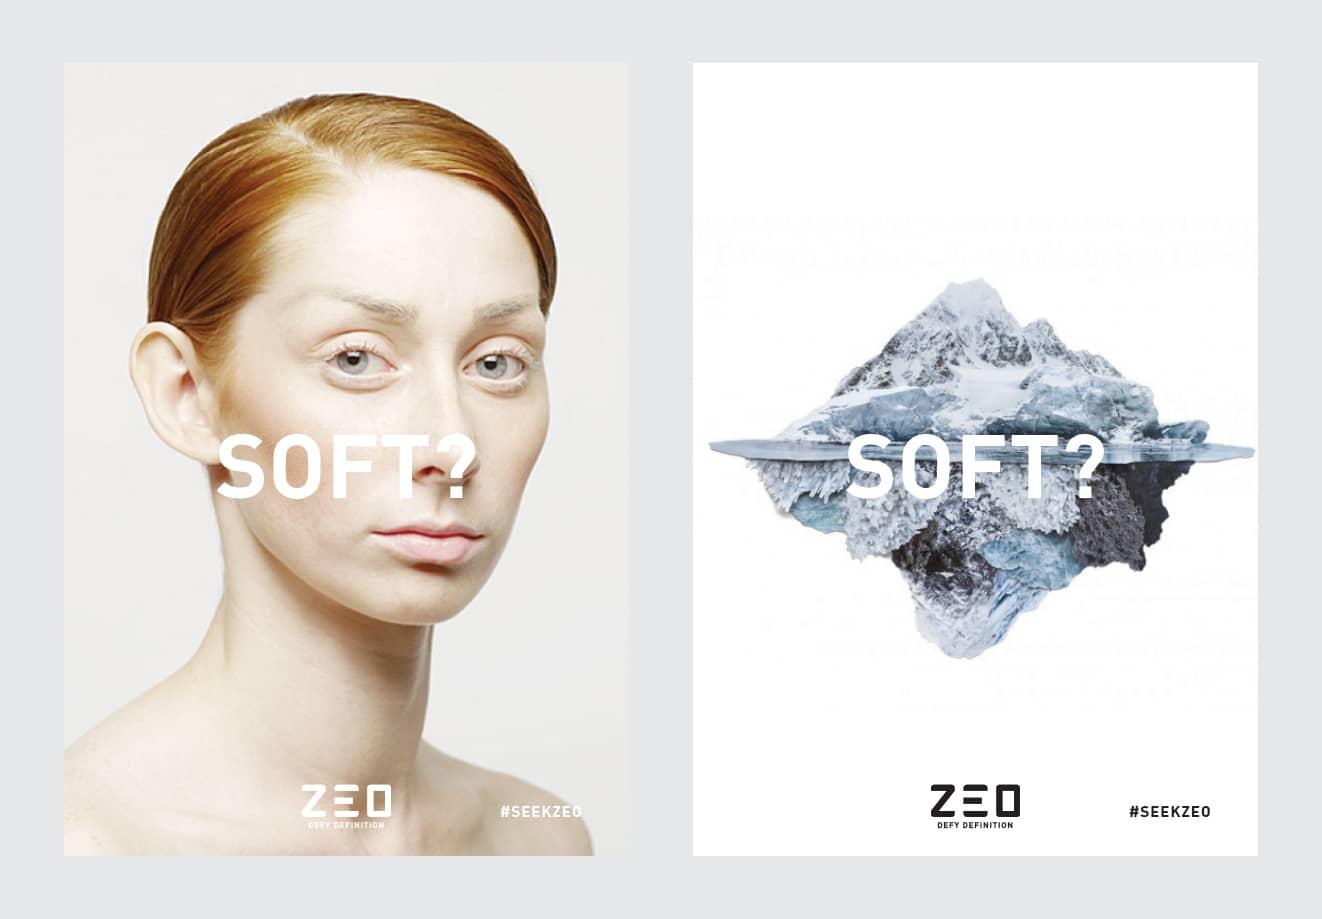 Zeo - Defy Definition